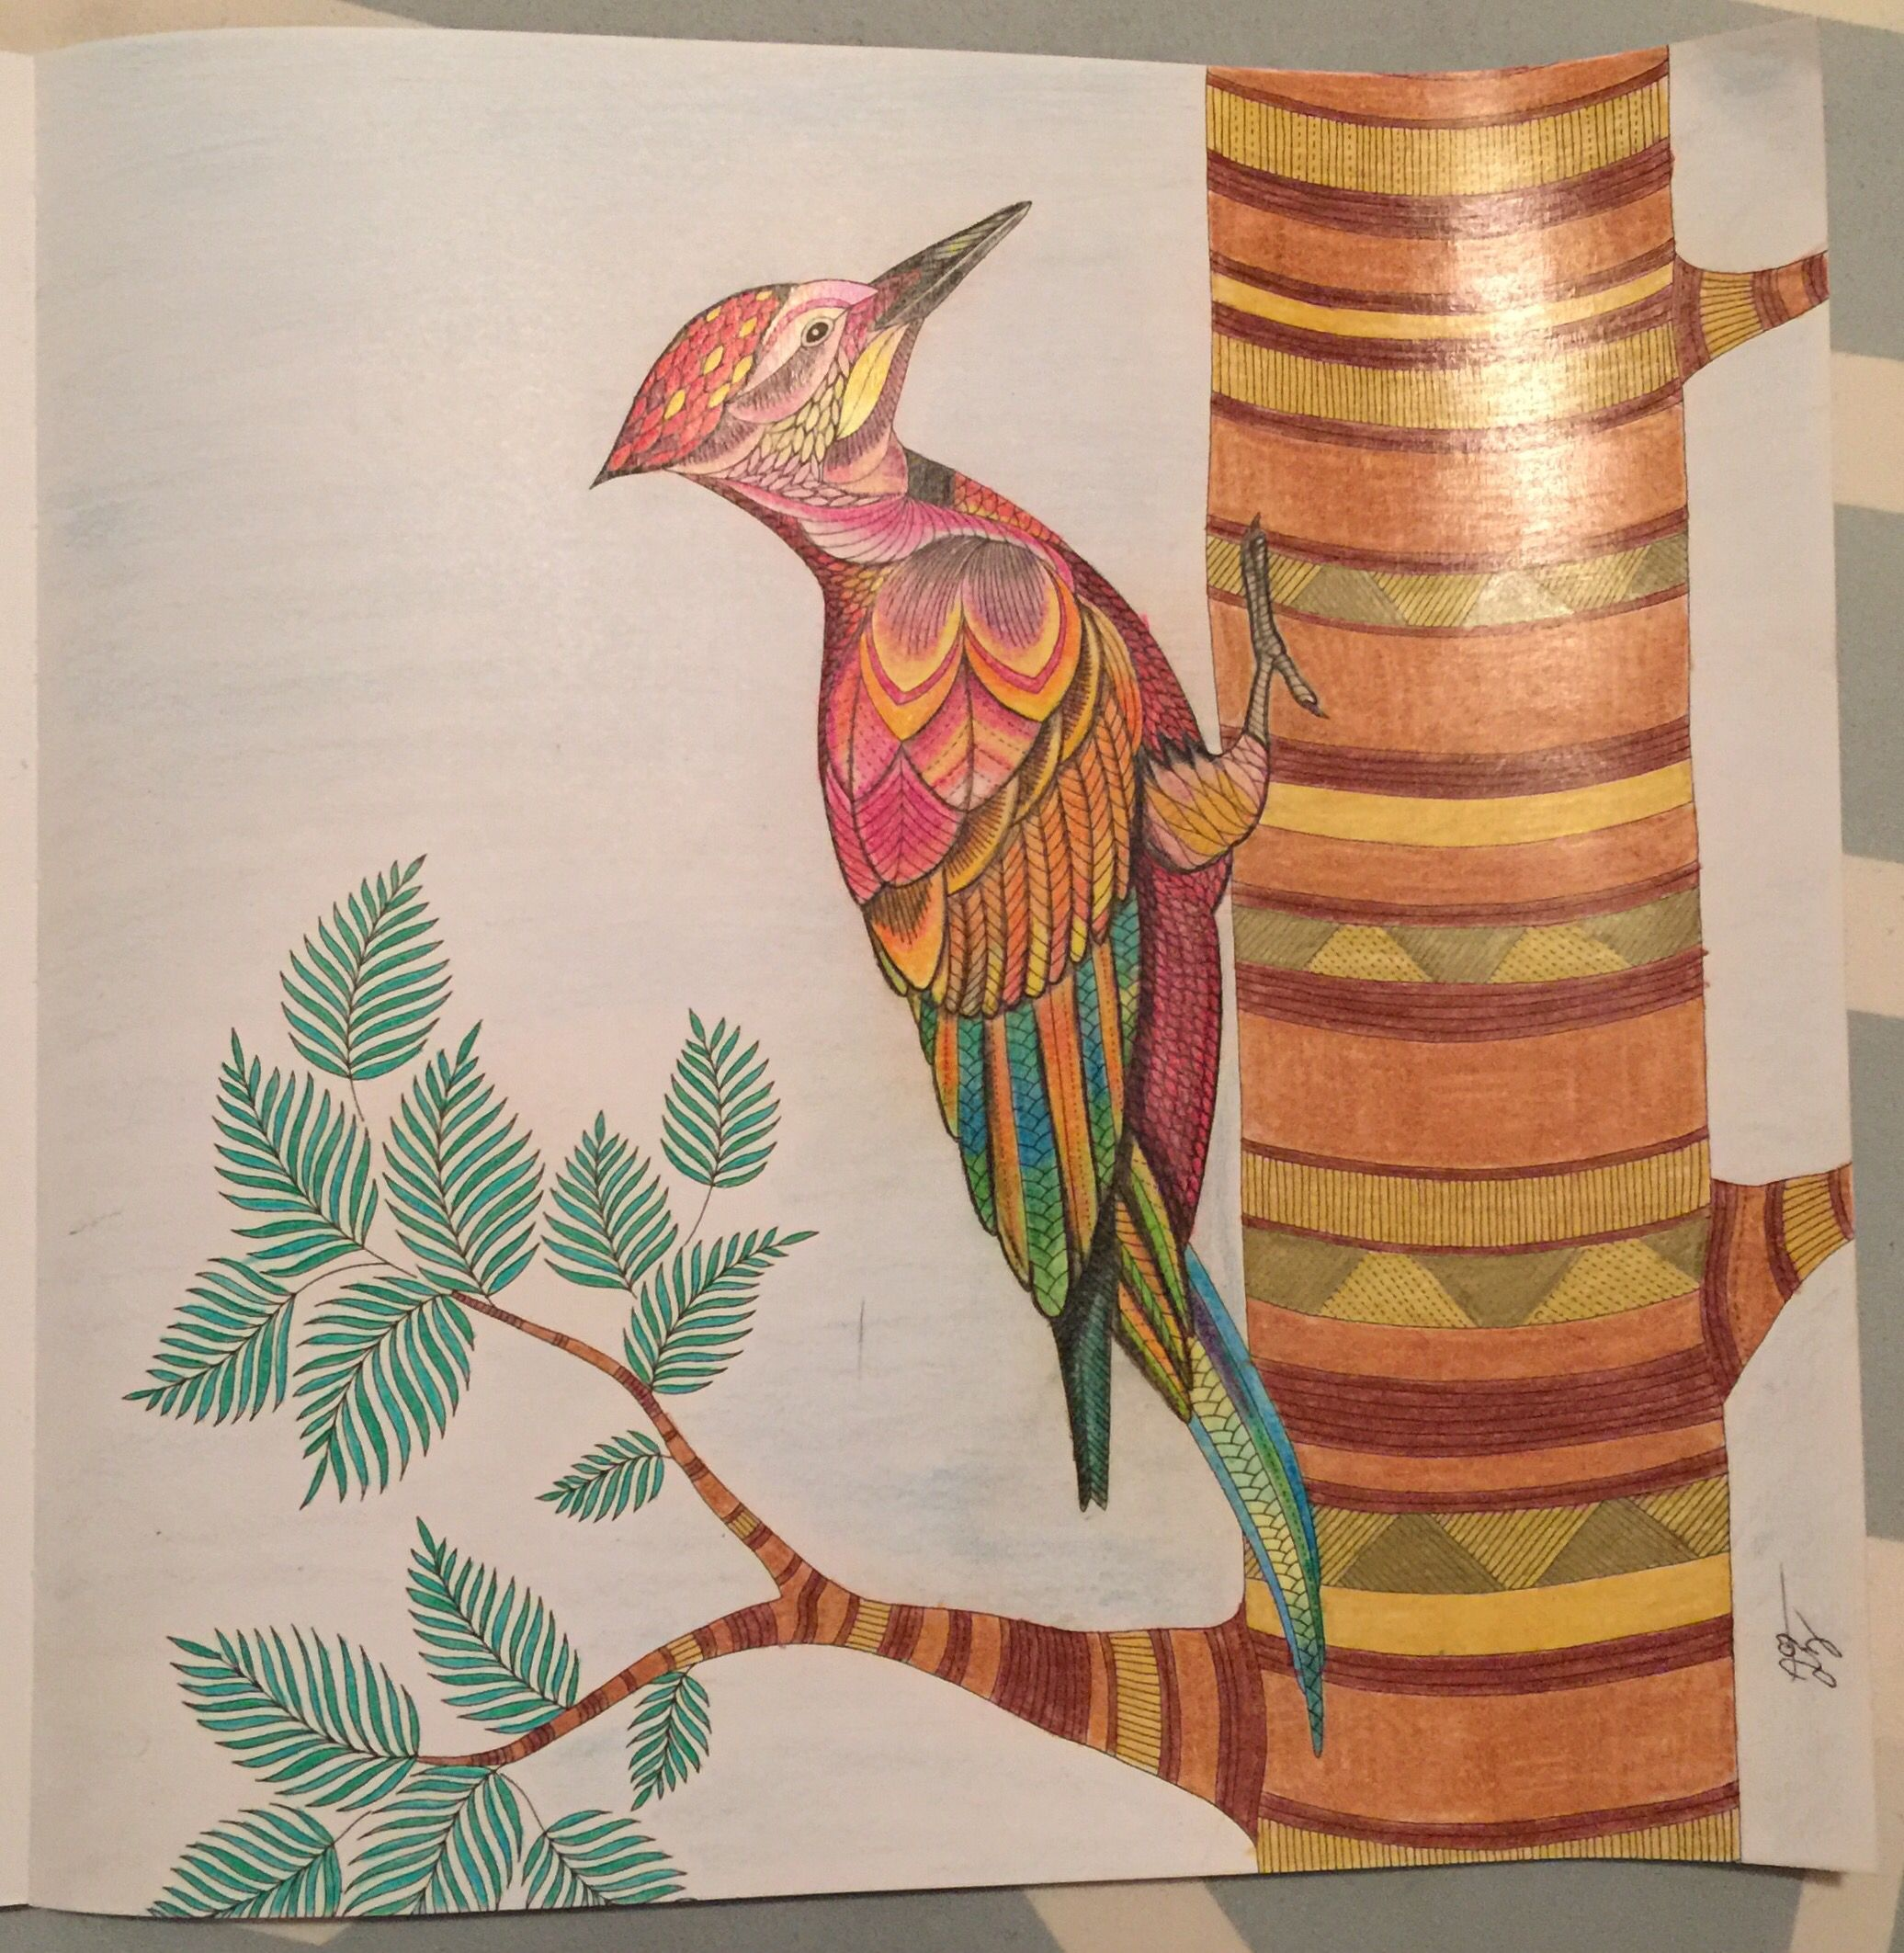 Color me draw me animal kingdom book - Bird Carpenter Bird Animal Kingdom Millie Marotta Birds Color Me Draw